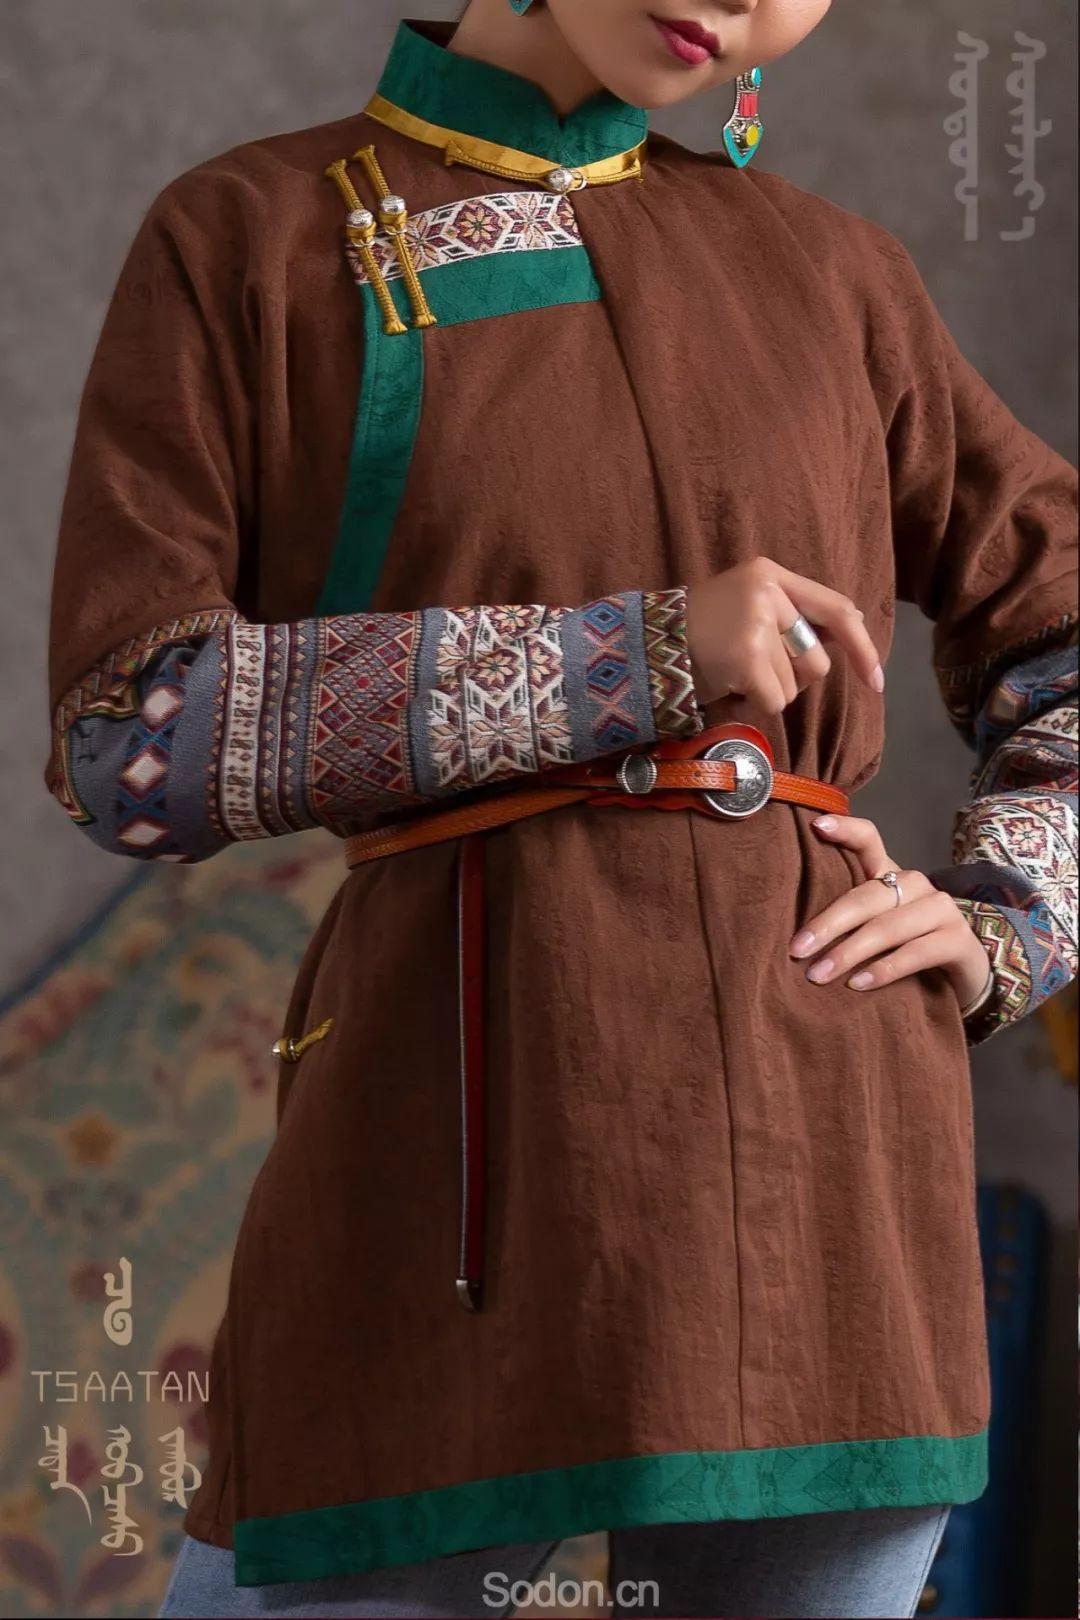 TSAATAN蒙古时装 2019夏季新款首发 第58张